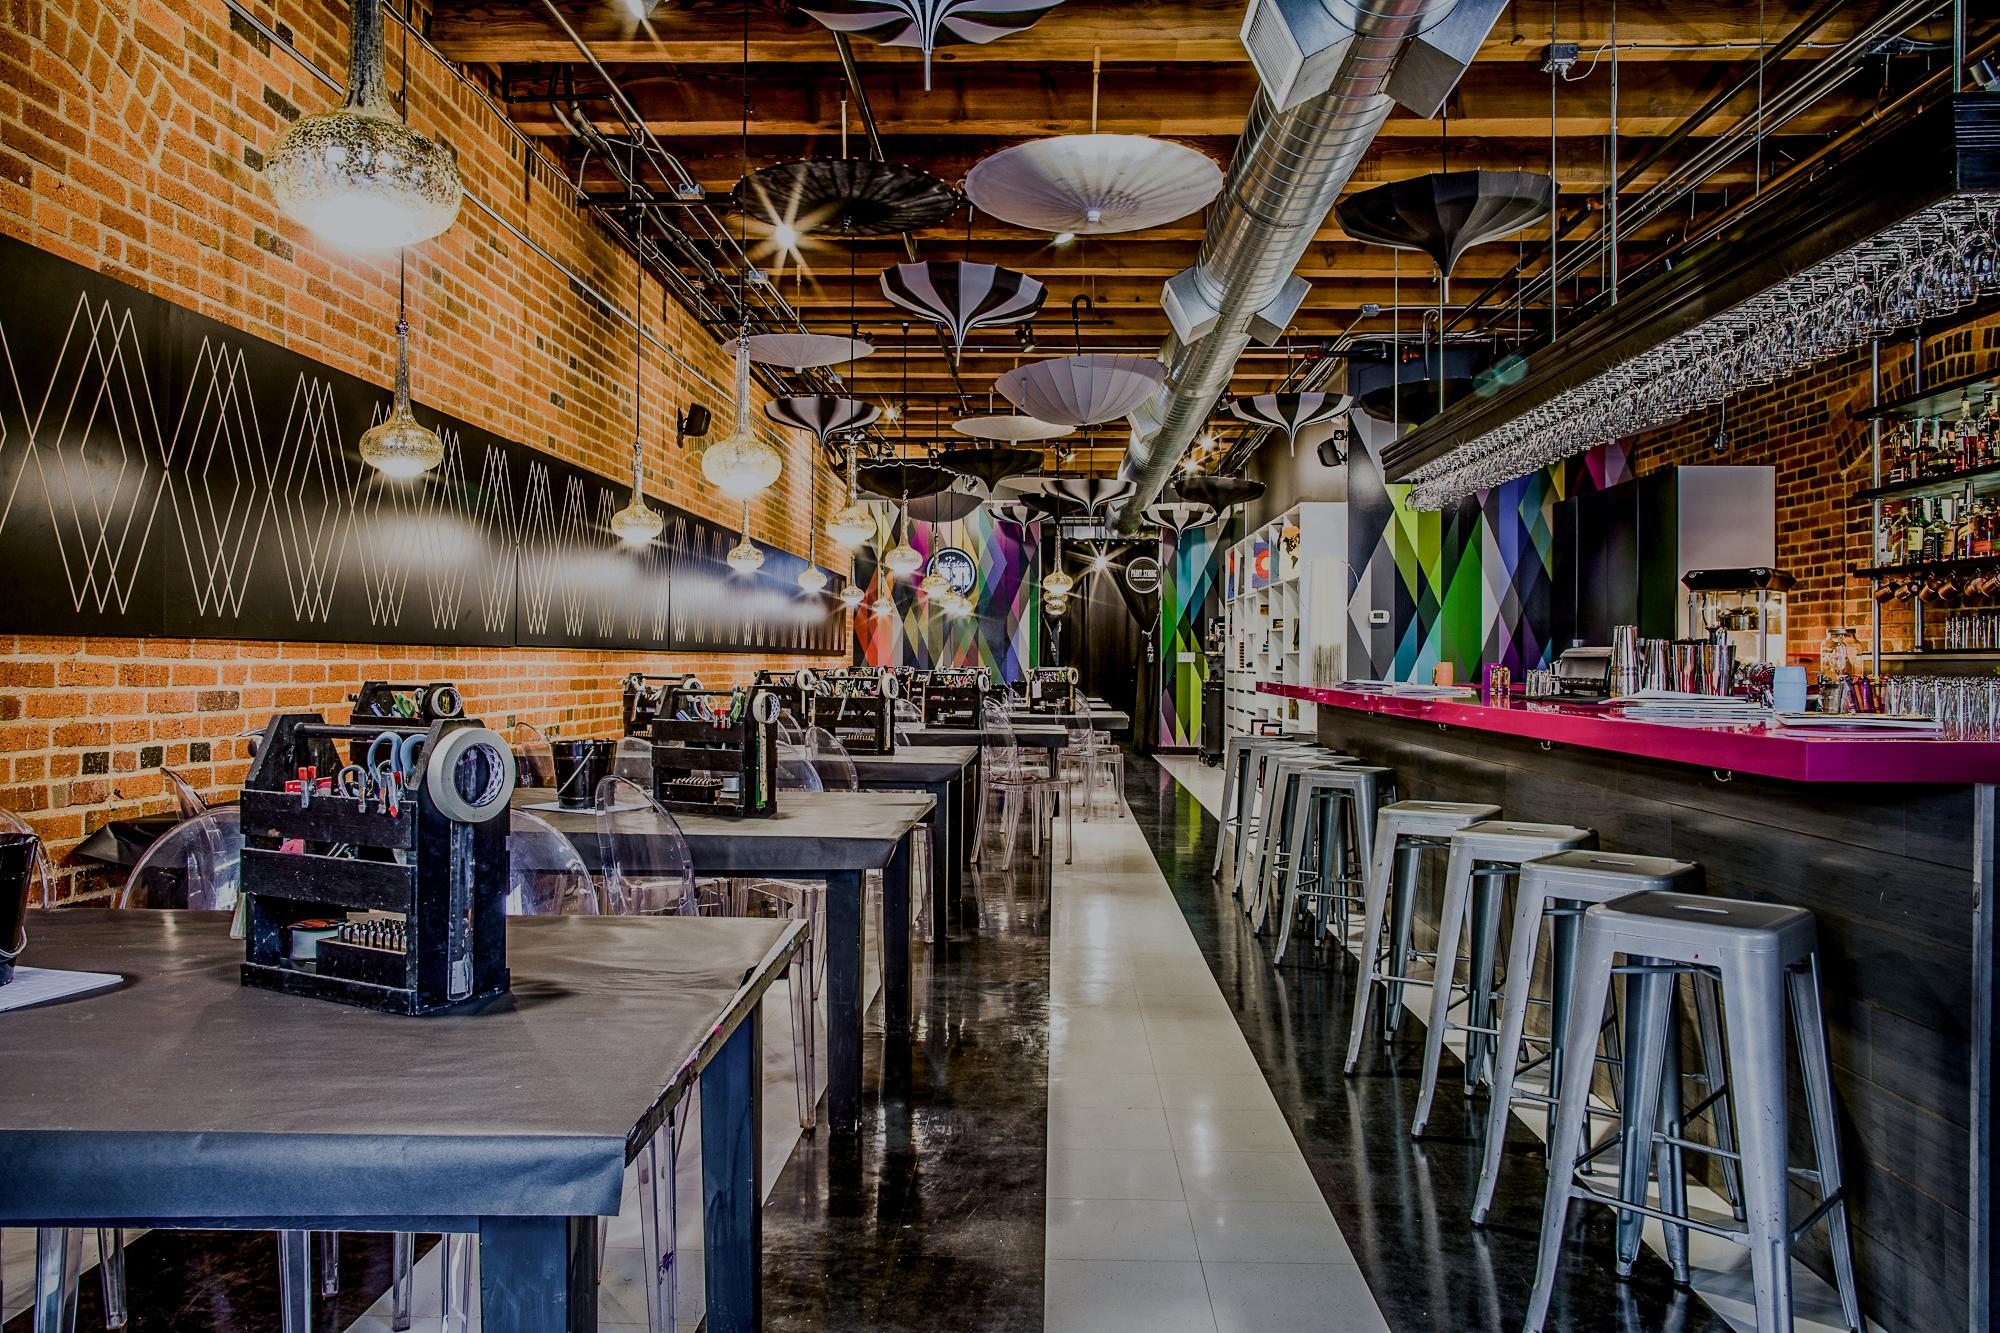 Upstairs Circus - Where DIY Workshop meets Bar